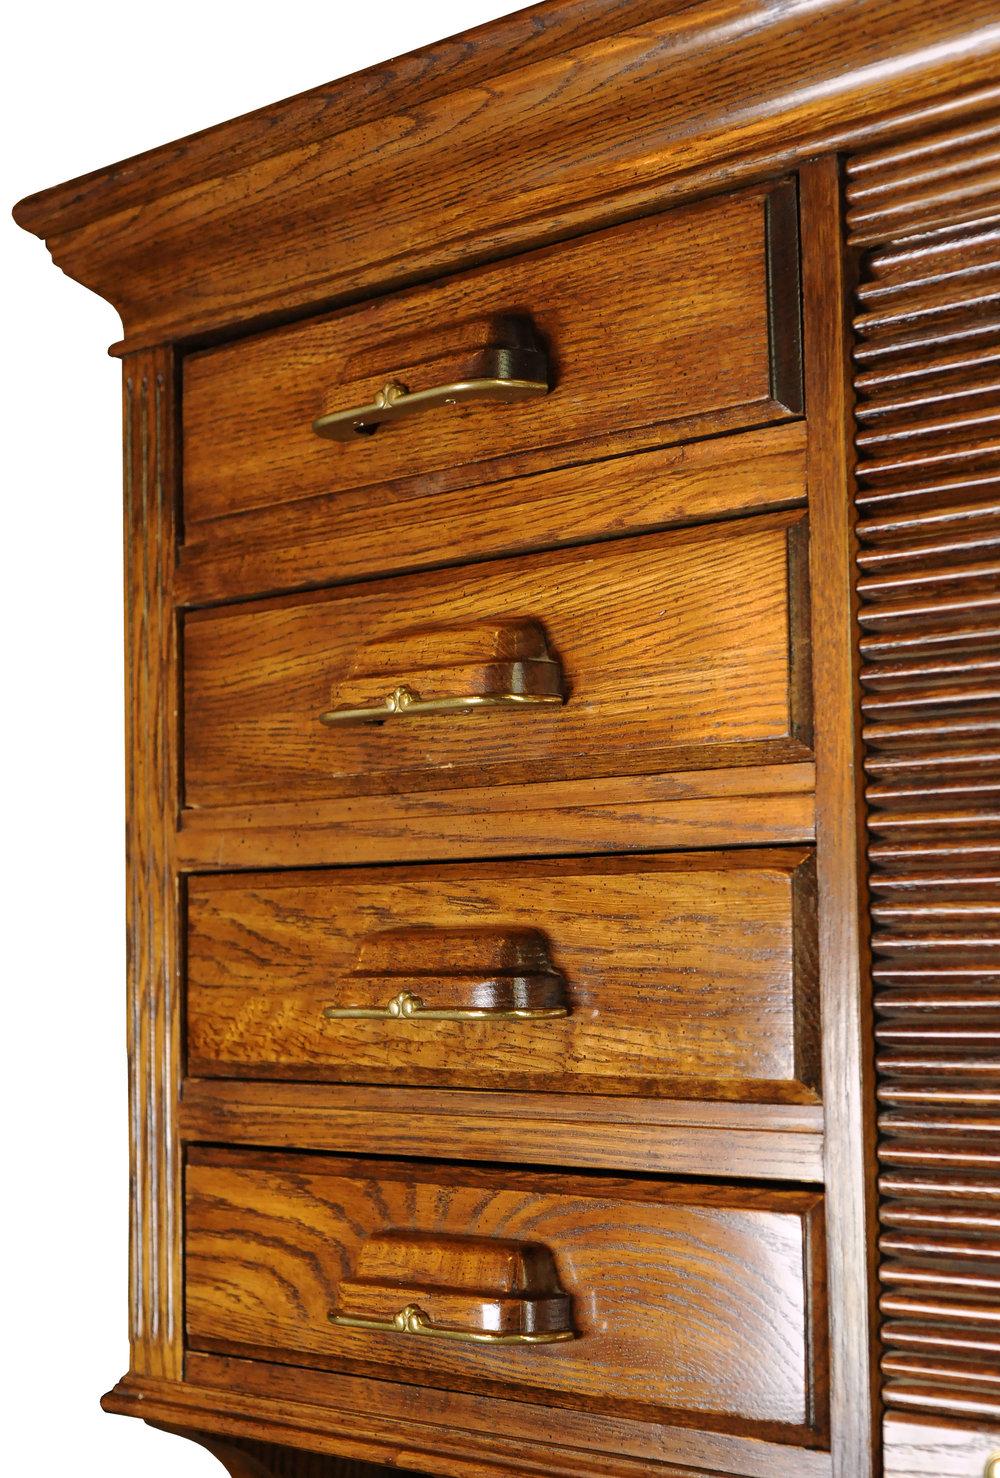 47117-rolltop-desk-drawer-detail.jpg